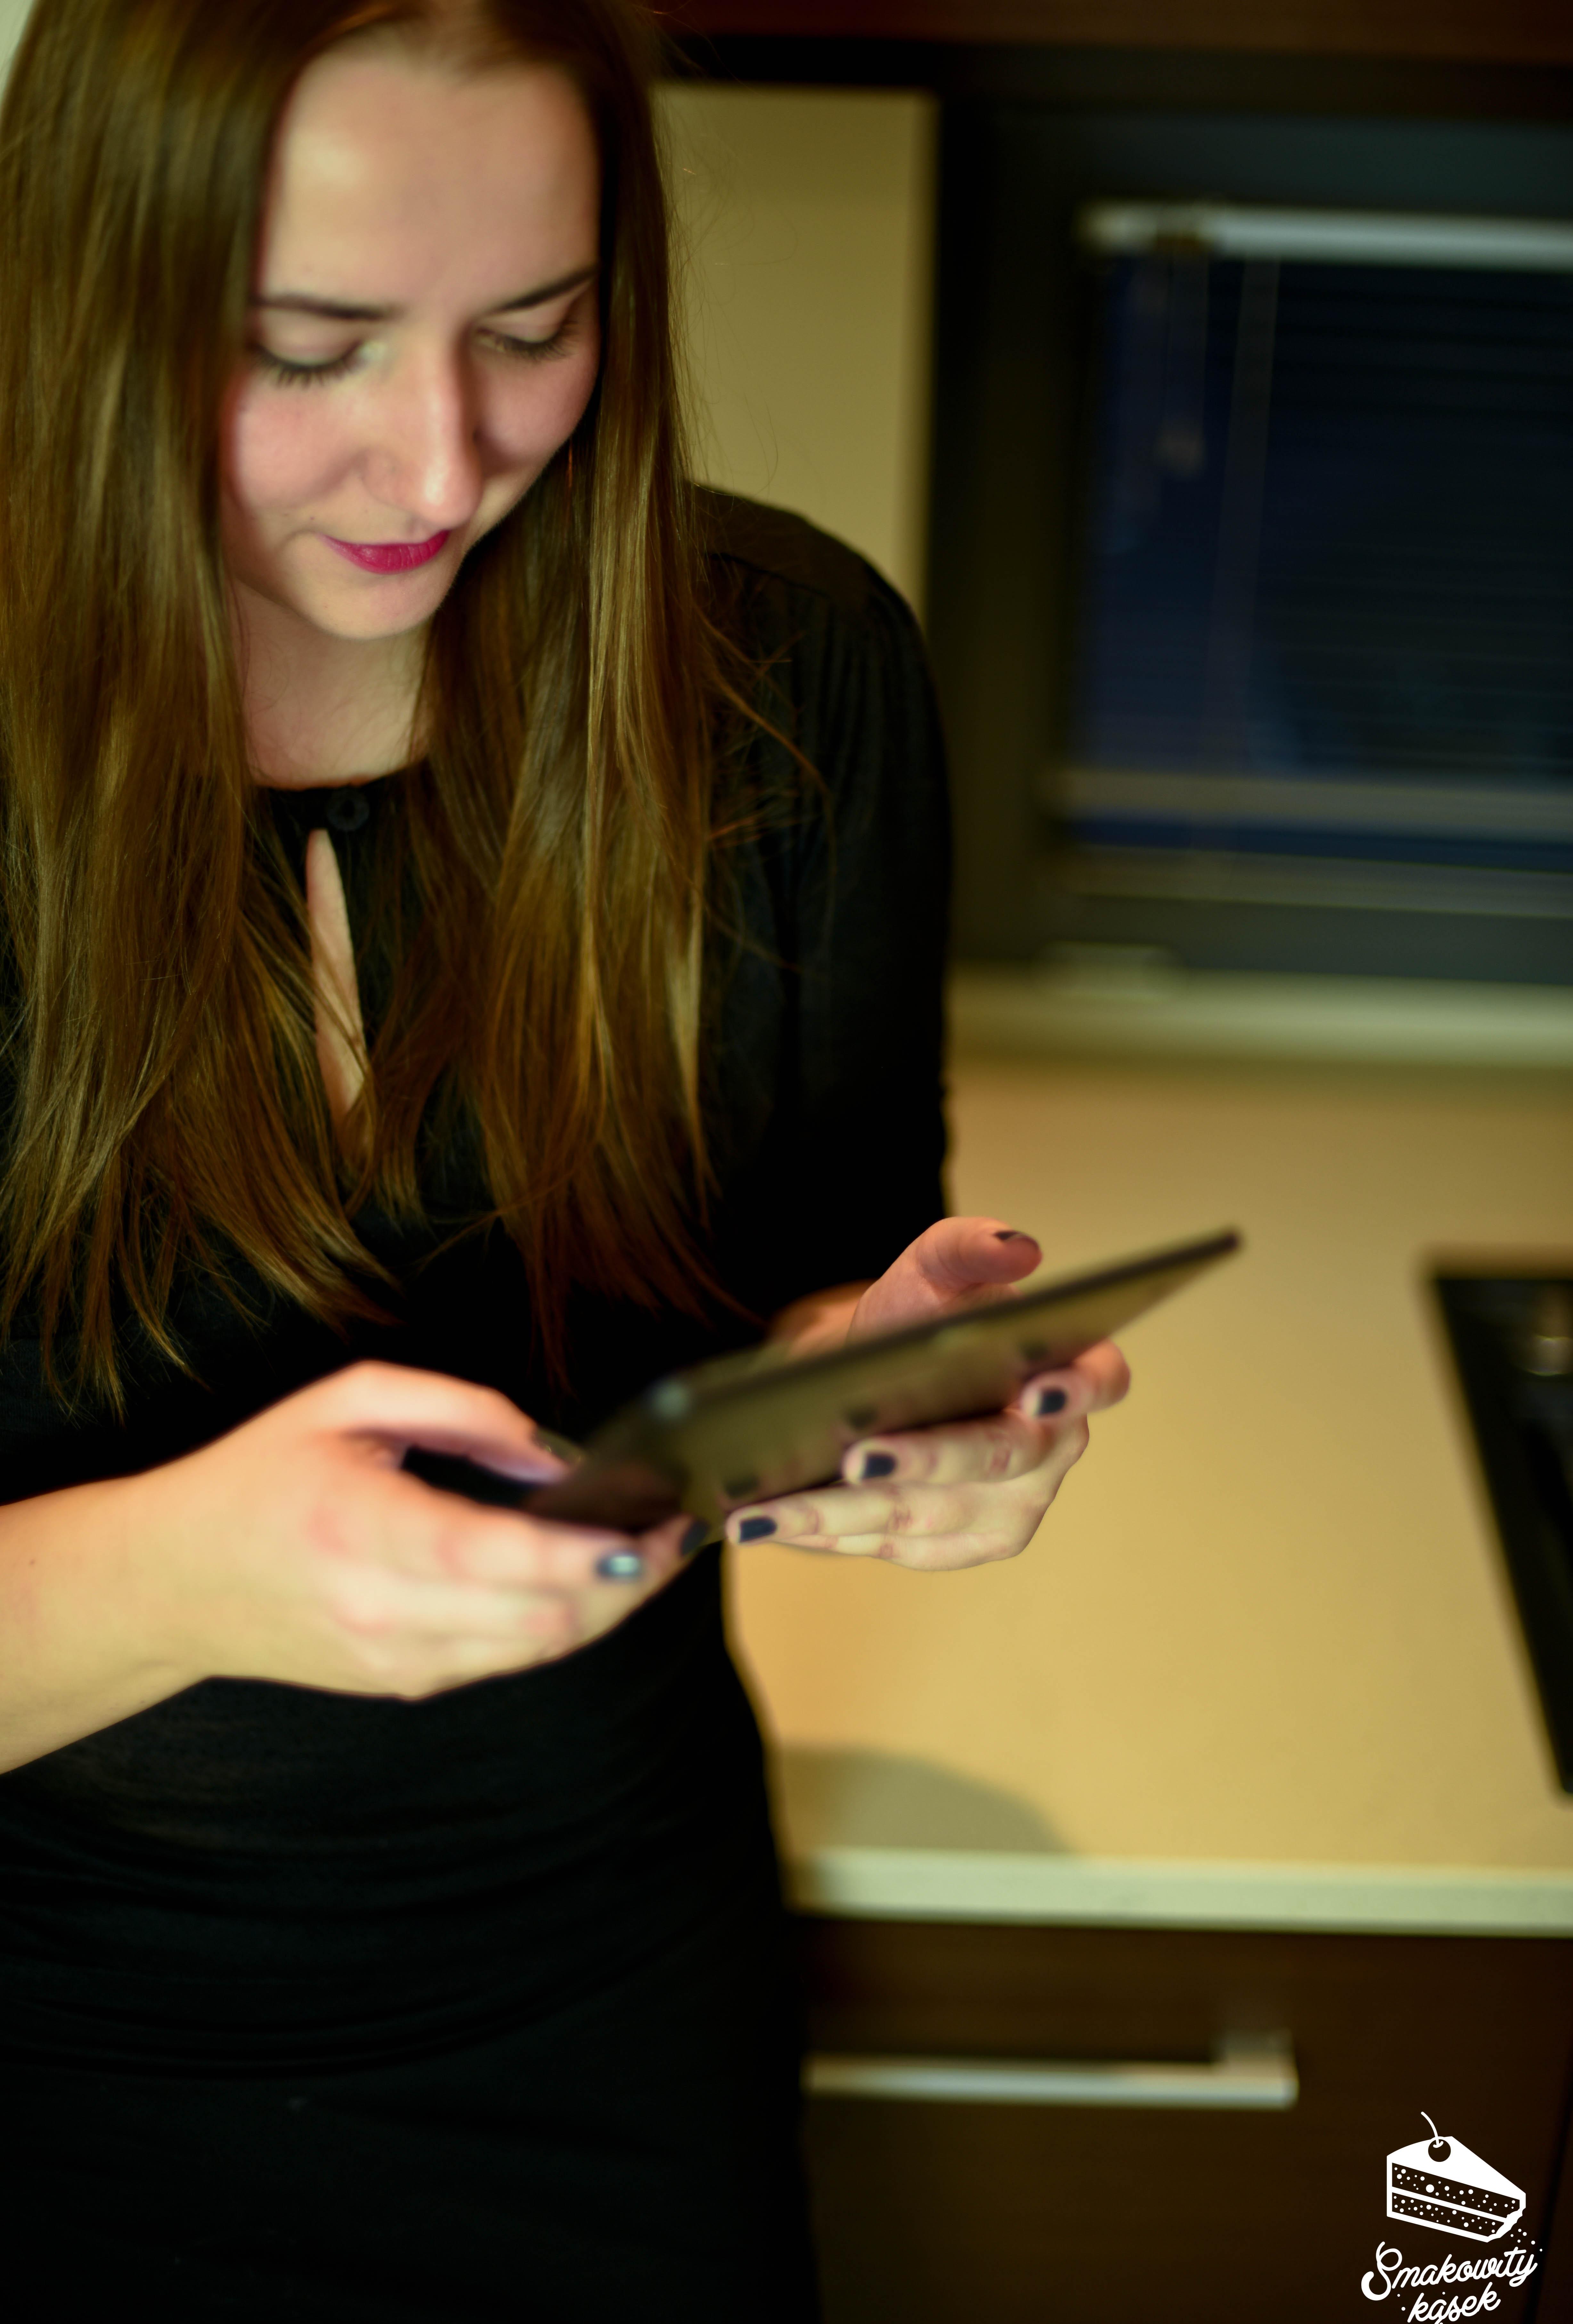 tablet samsung (1 of 1)-5